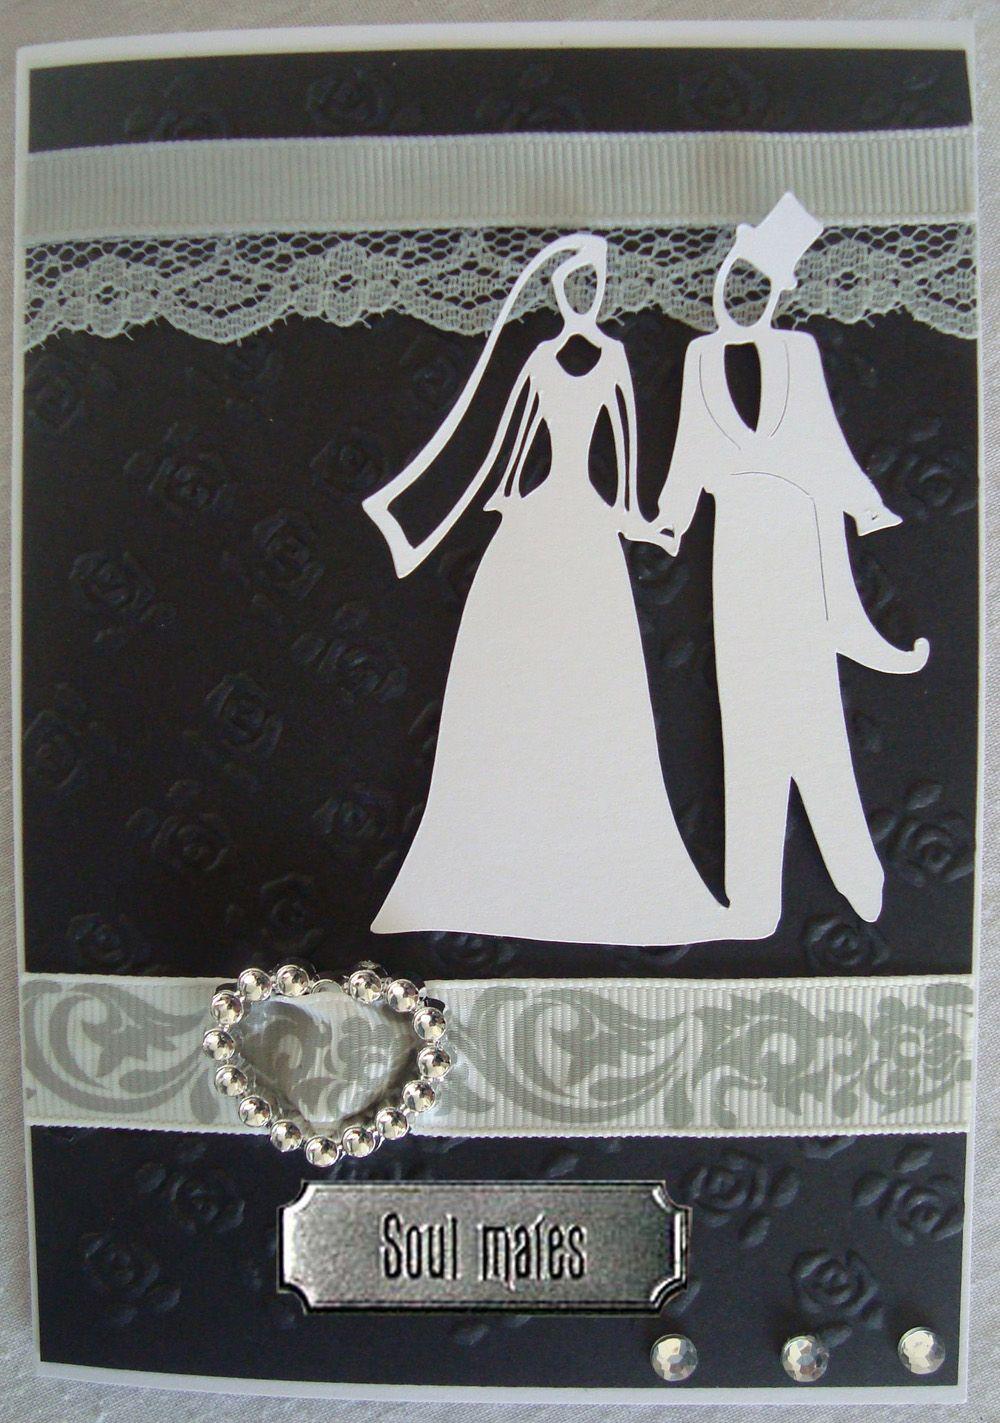 How to scrapbook wedding cards - Cricut Wedding Scrapbook Layouts Card Making Ideas Wedding Cards Card And Scrapbooking Supplies